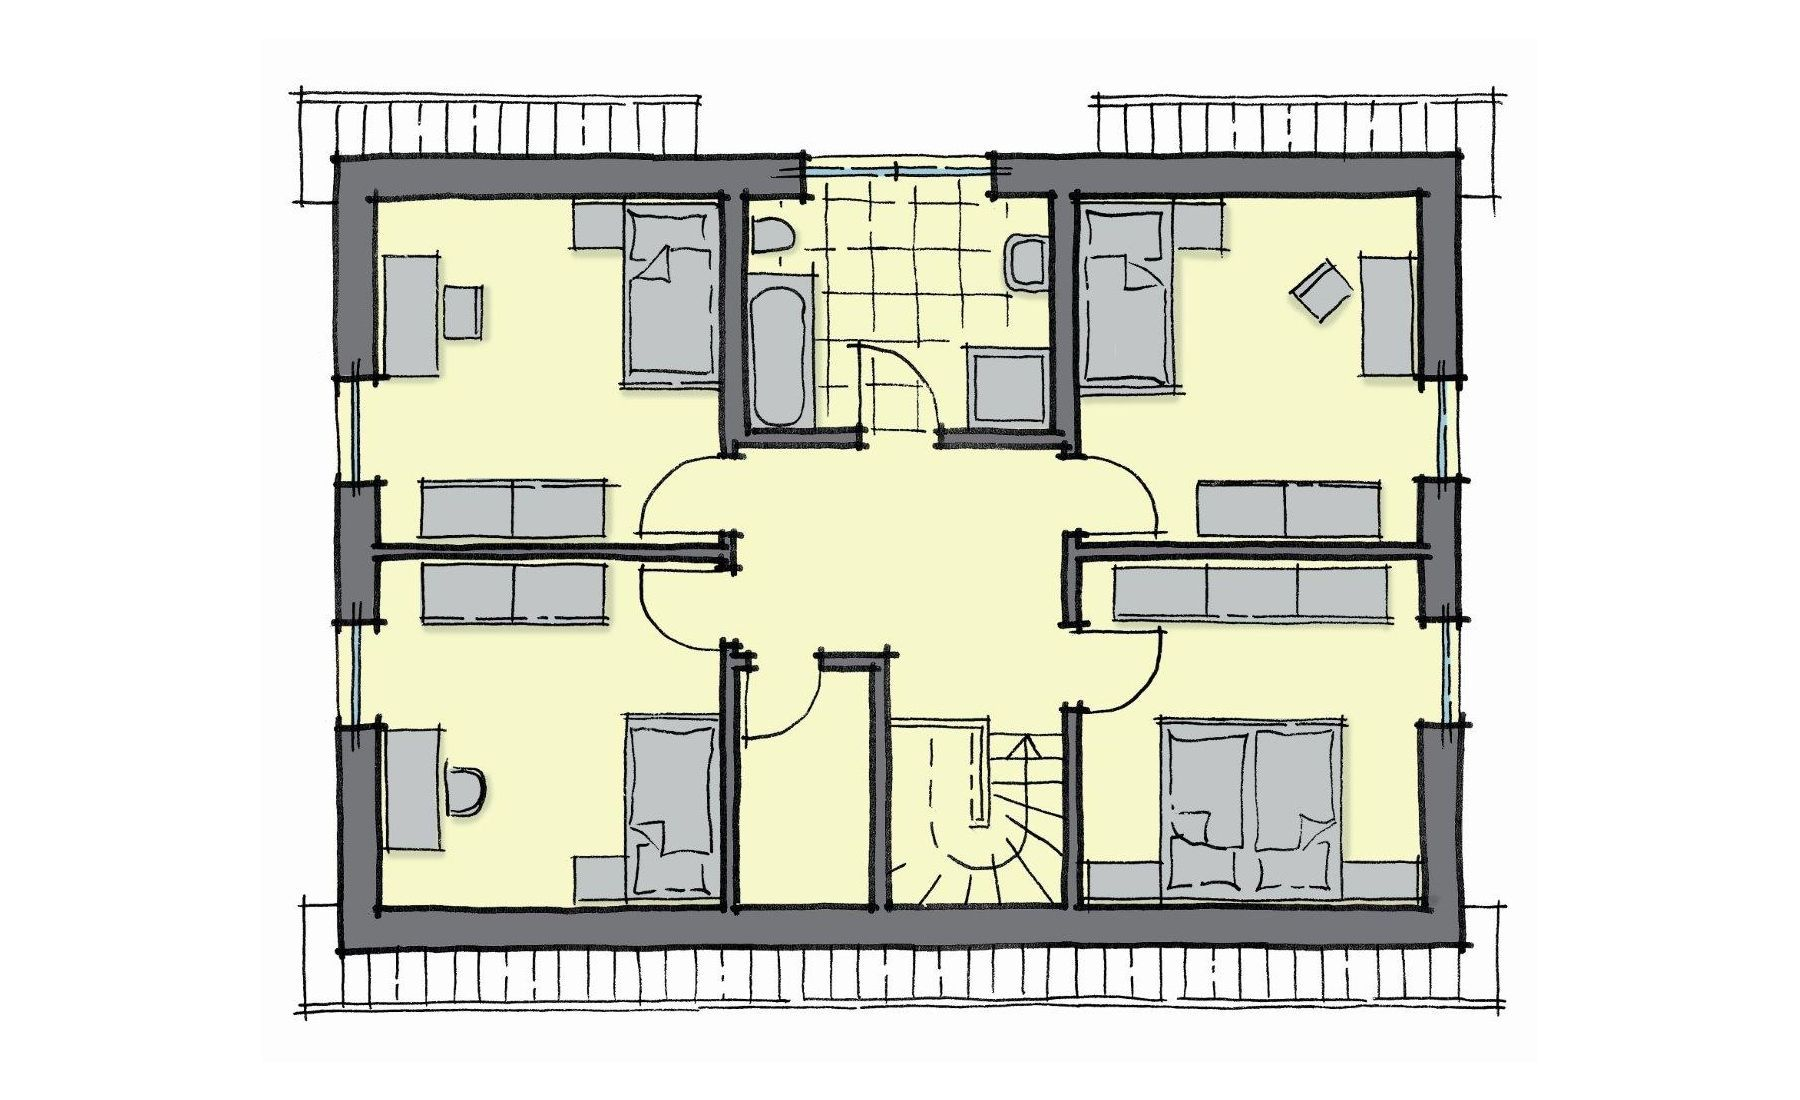 Grundriss Einfamilienhaus Dachgeschoss mit 3 Kinderzimmer ...